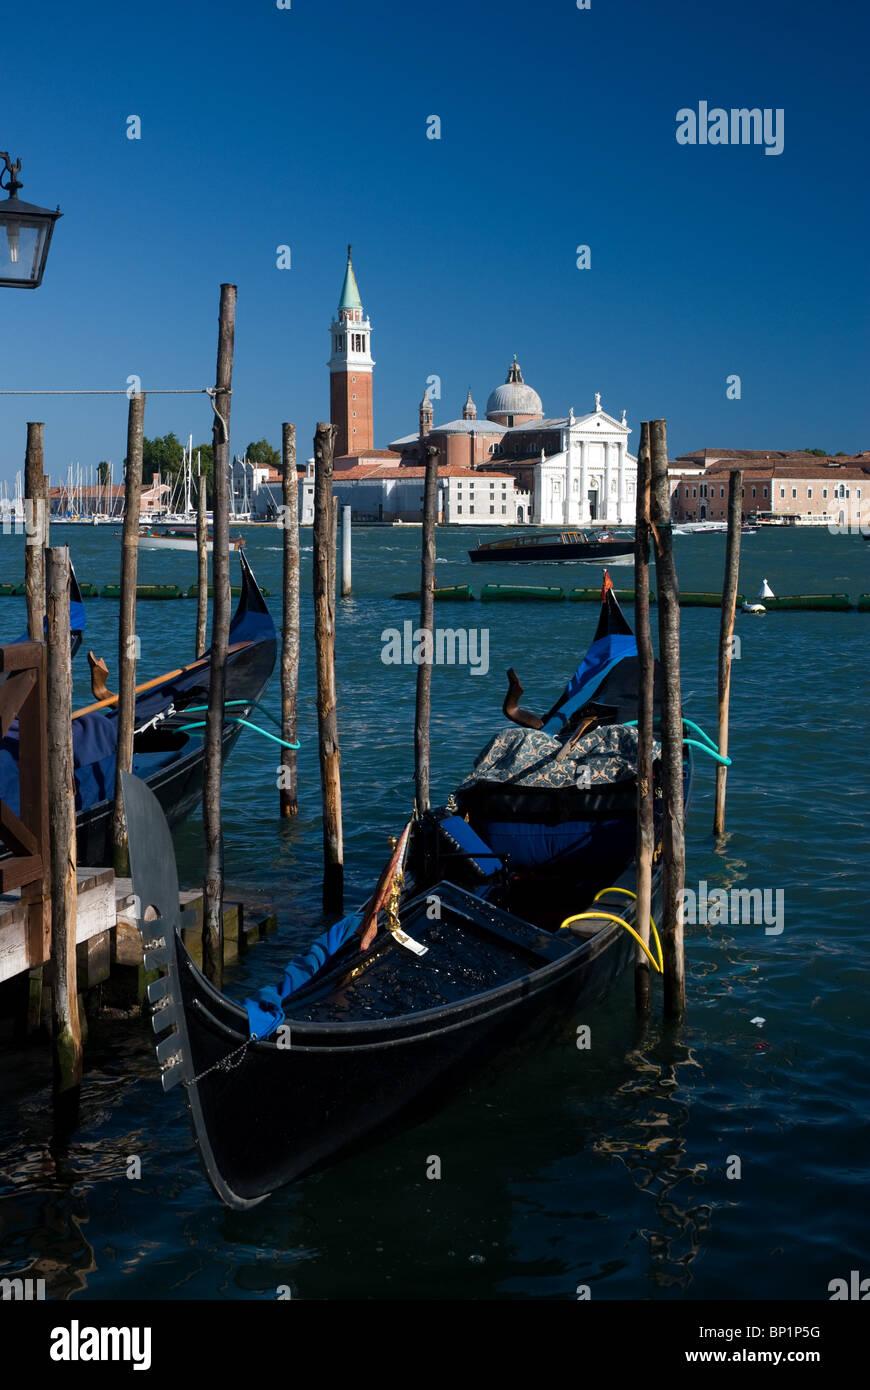 Grand canal and gondolas, Venice, Italy - Stock Image